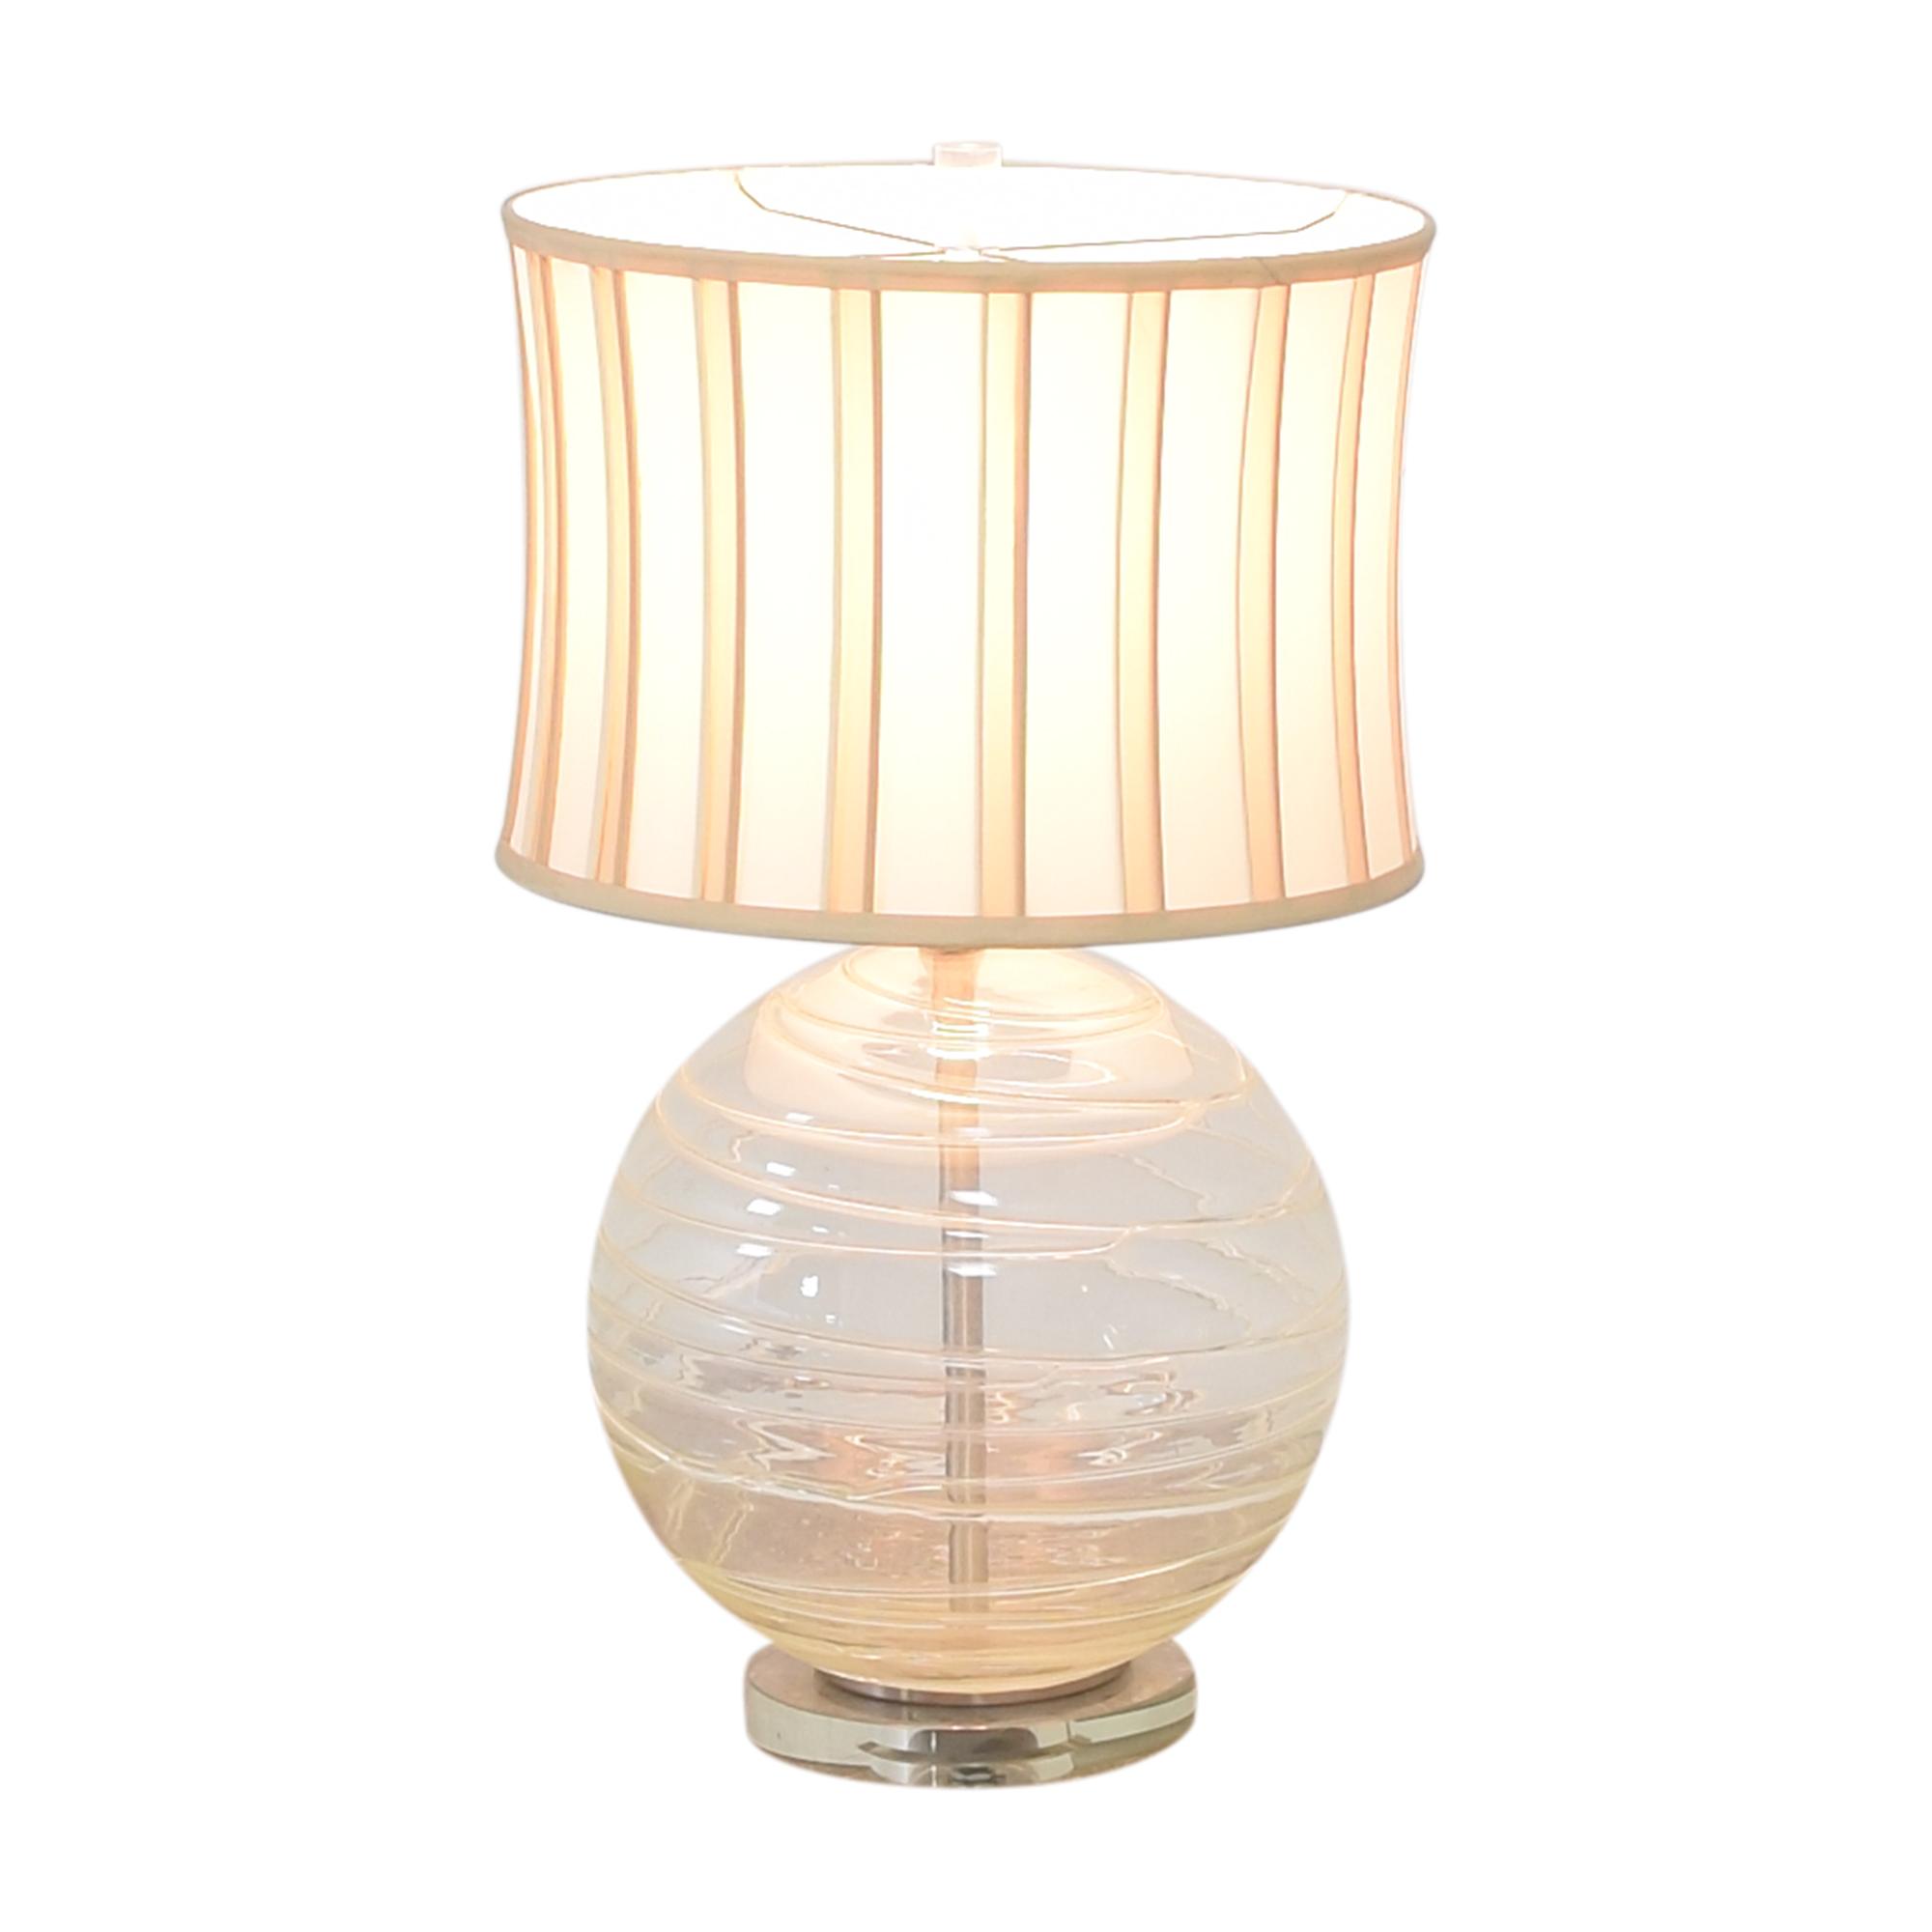 Striped Orb Lamp price